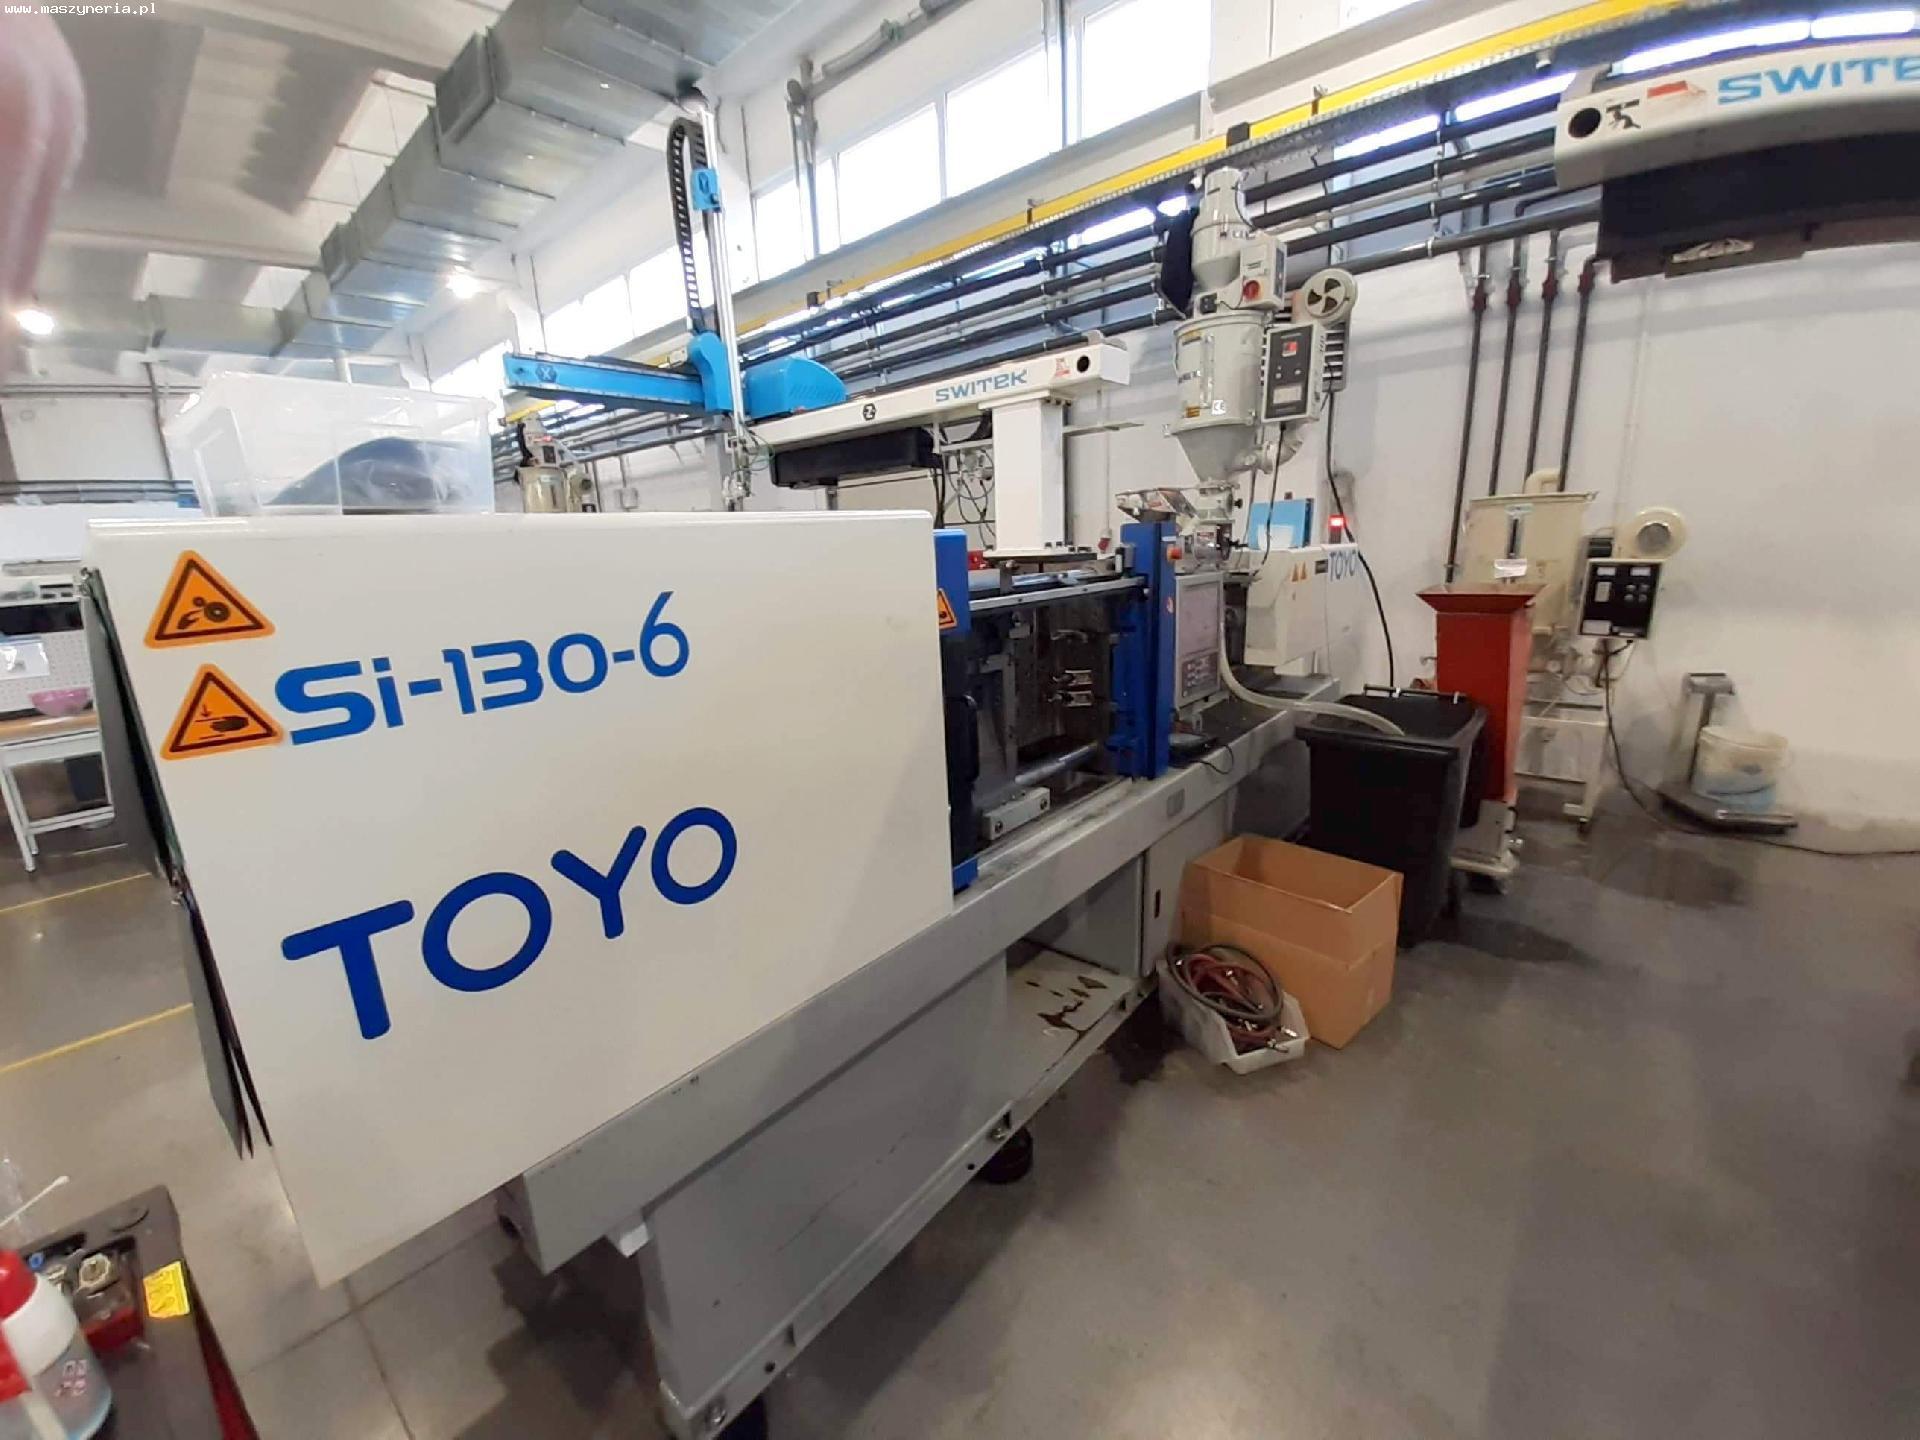 TOYO MACCHINE SI-130-6 iniezione plastica macchina in vendita - foto 1